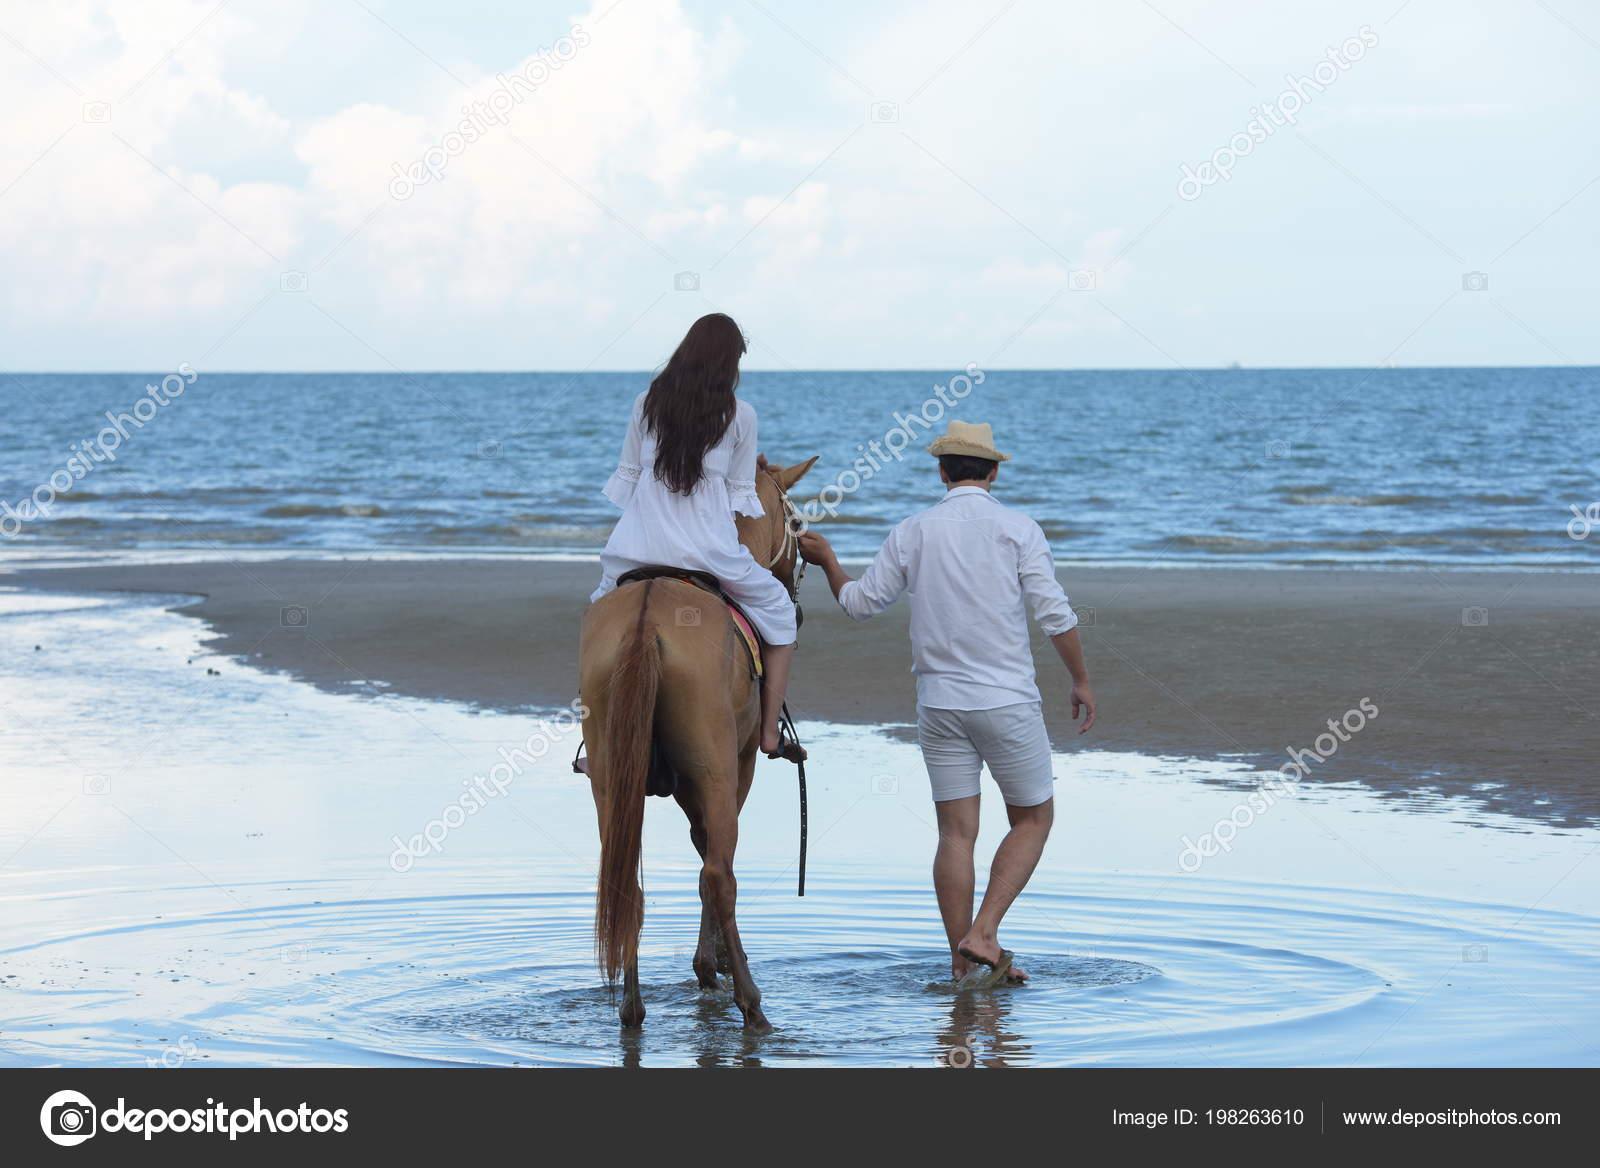 Couples Horses Walking Beach Evening Sunset Stock Photo